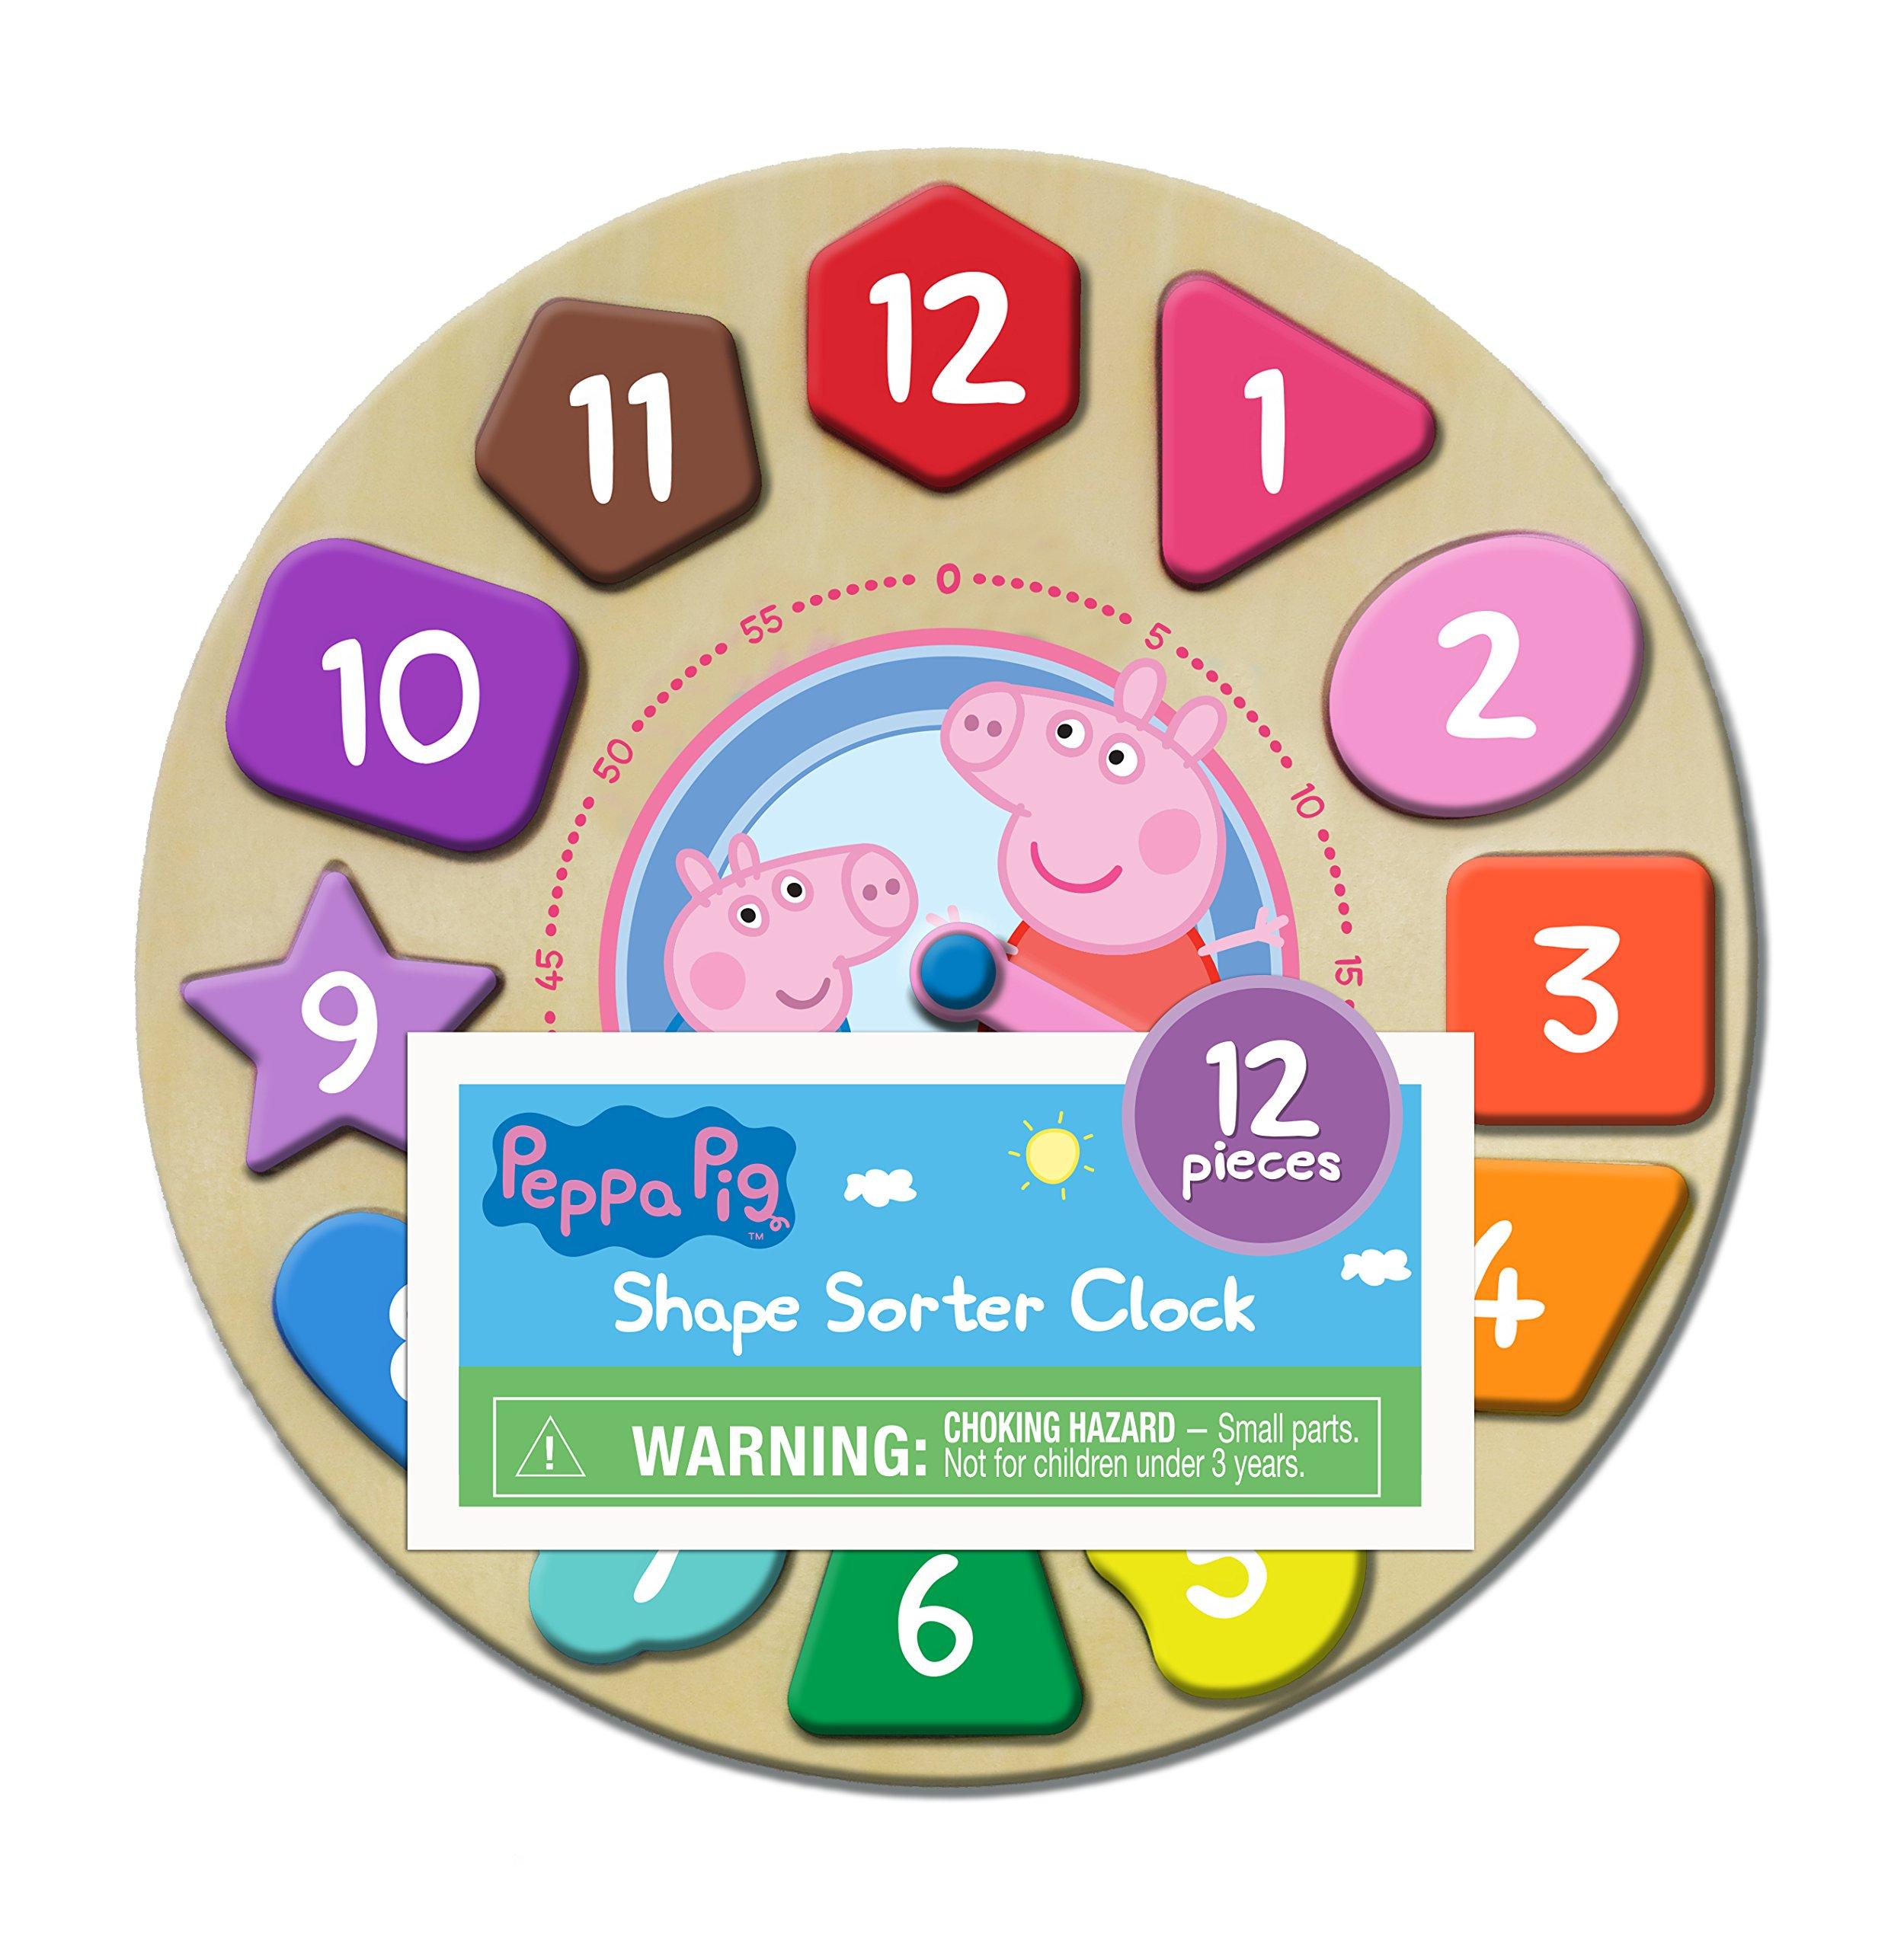 Peppa Pig Shape Sorter Clock Puzzle (12 Piece)